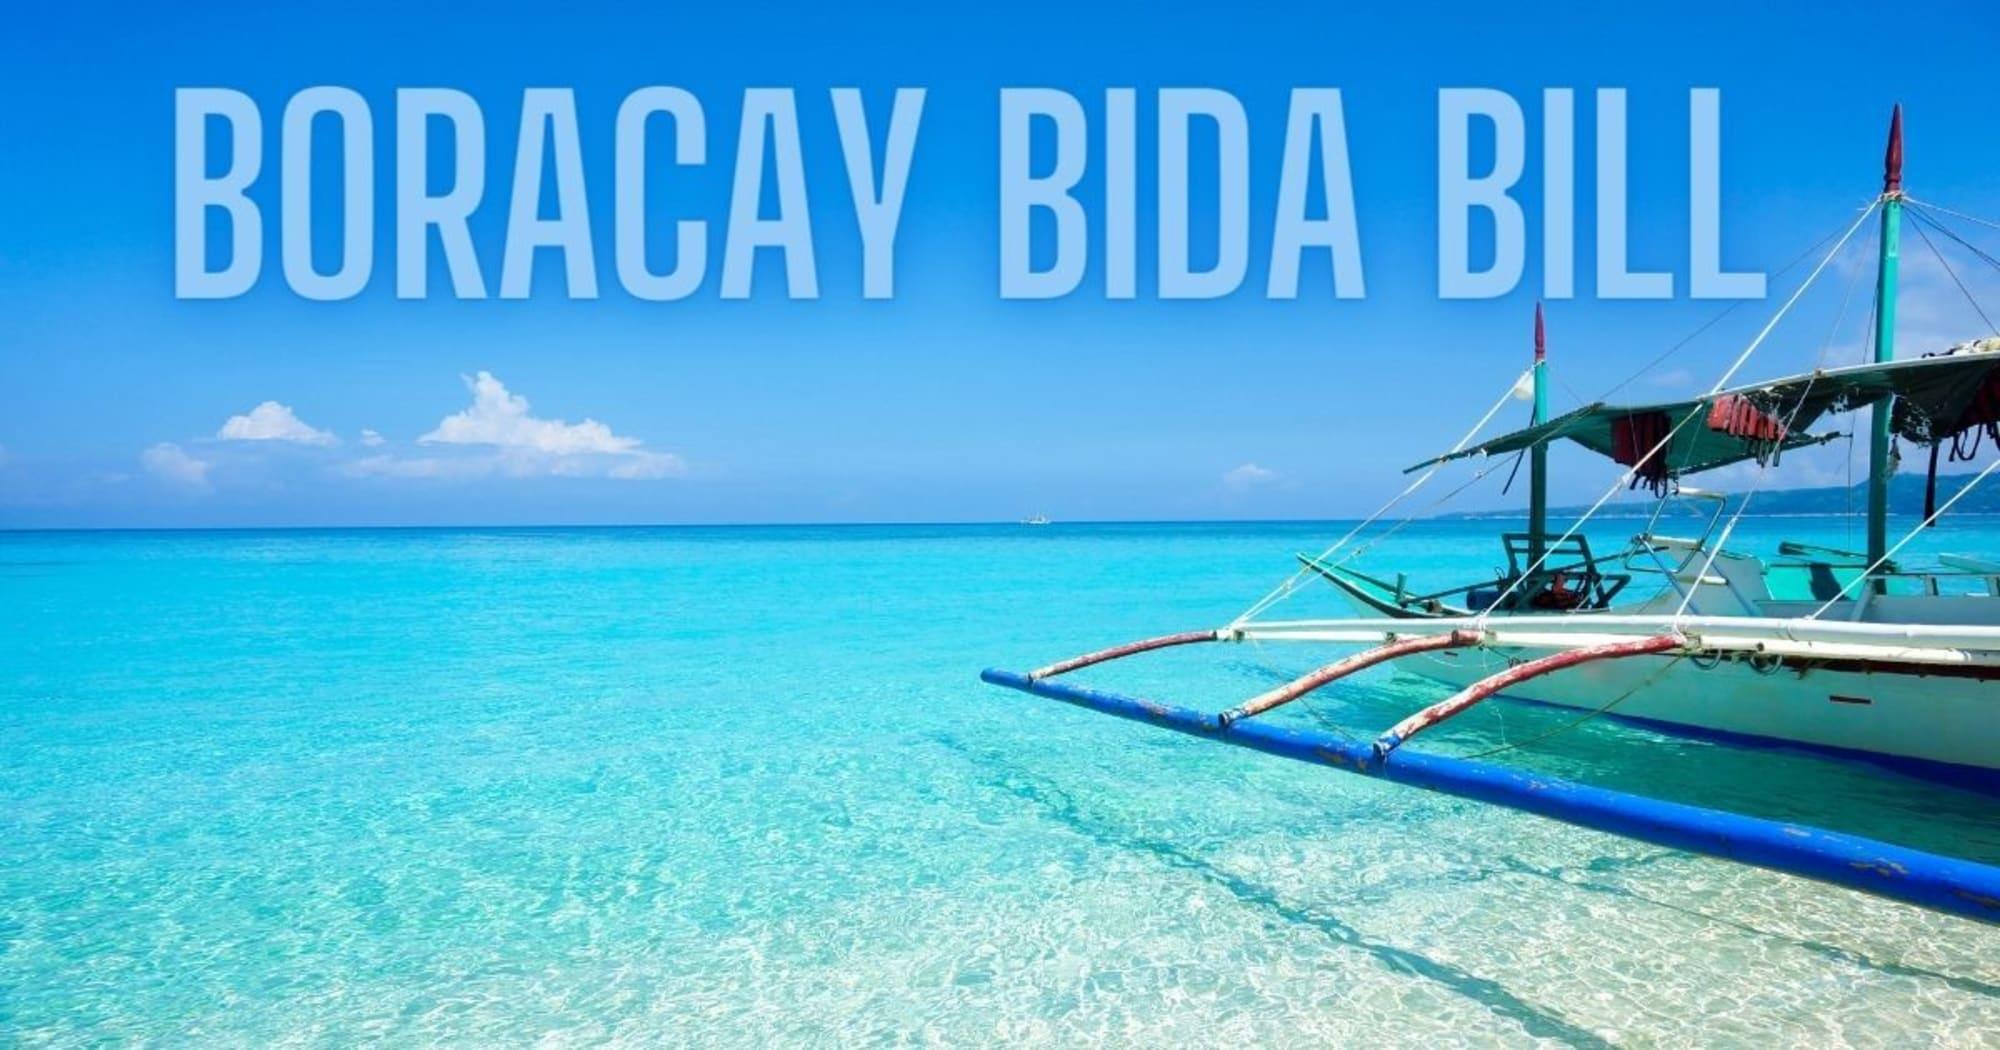 The BIDA Bill and the turbulence facing the Boracay tourism industry